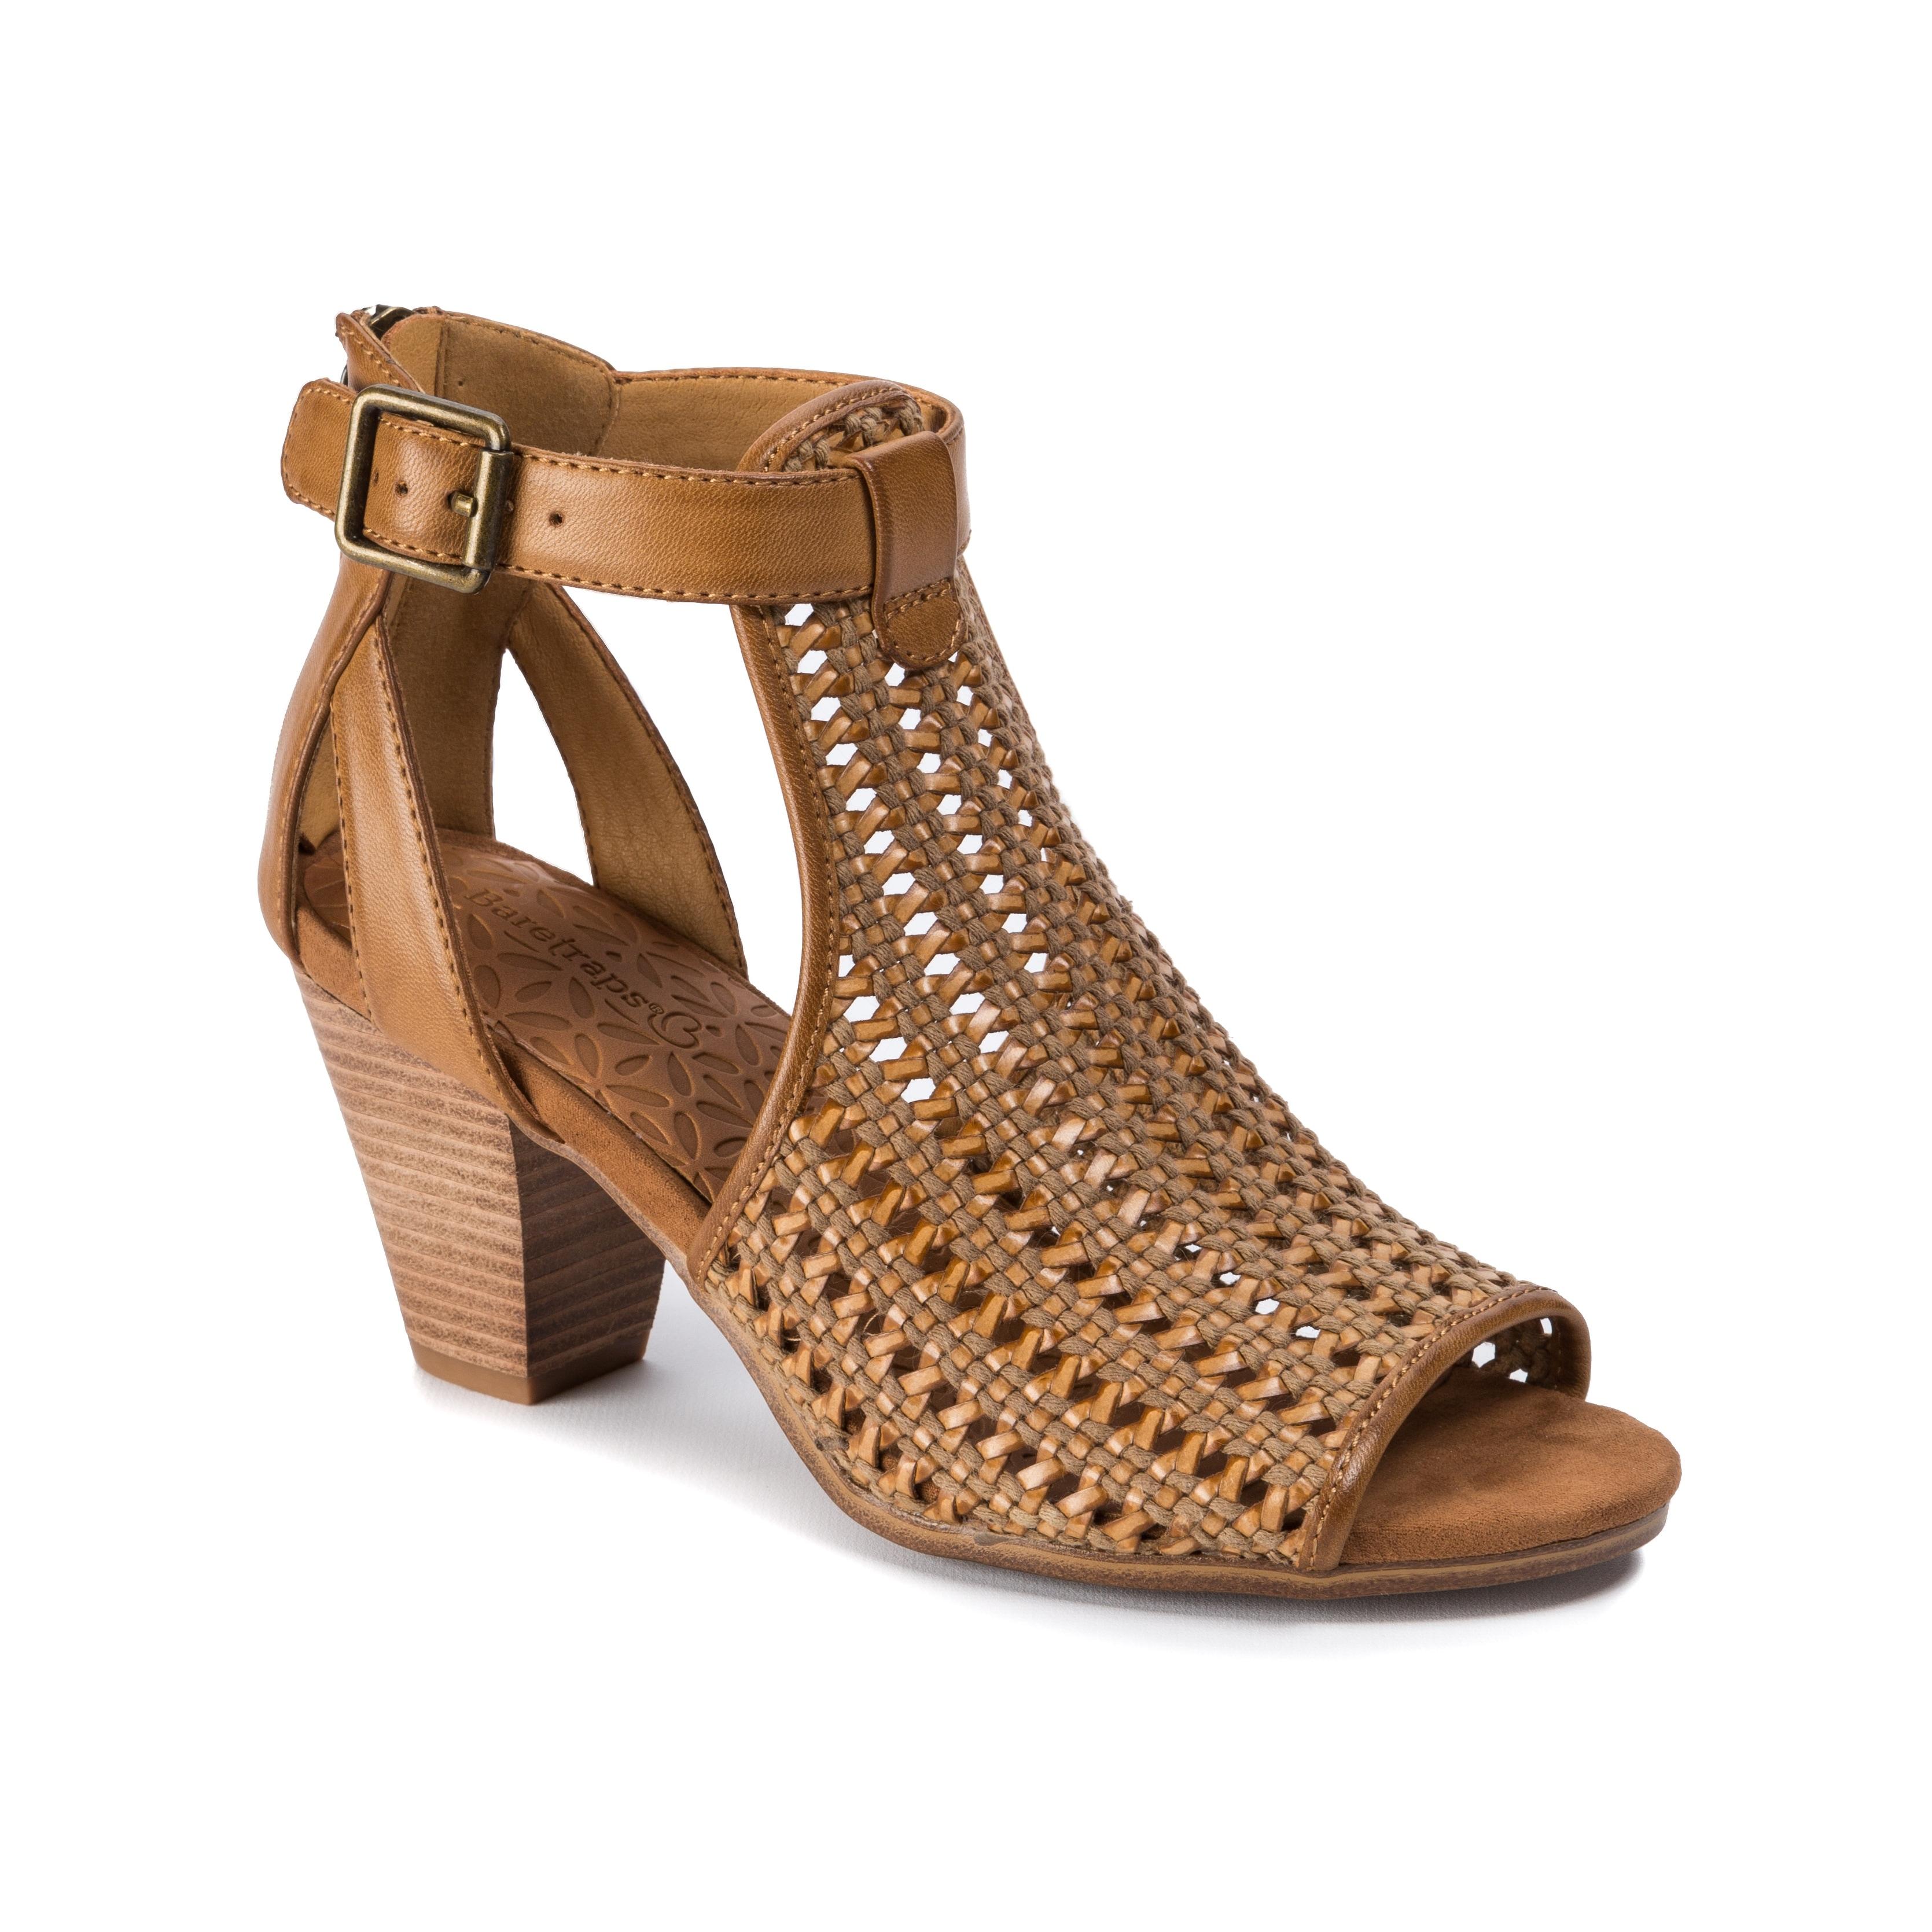 a8f077226693 Buy Baretraps Women s Sandals Online at Overstock